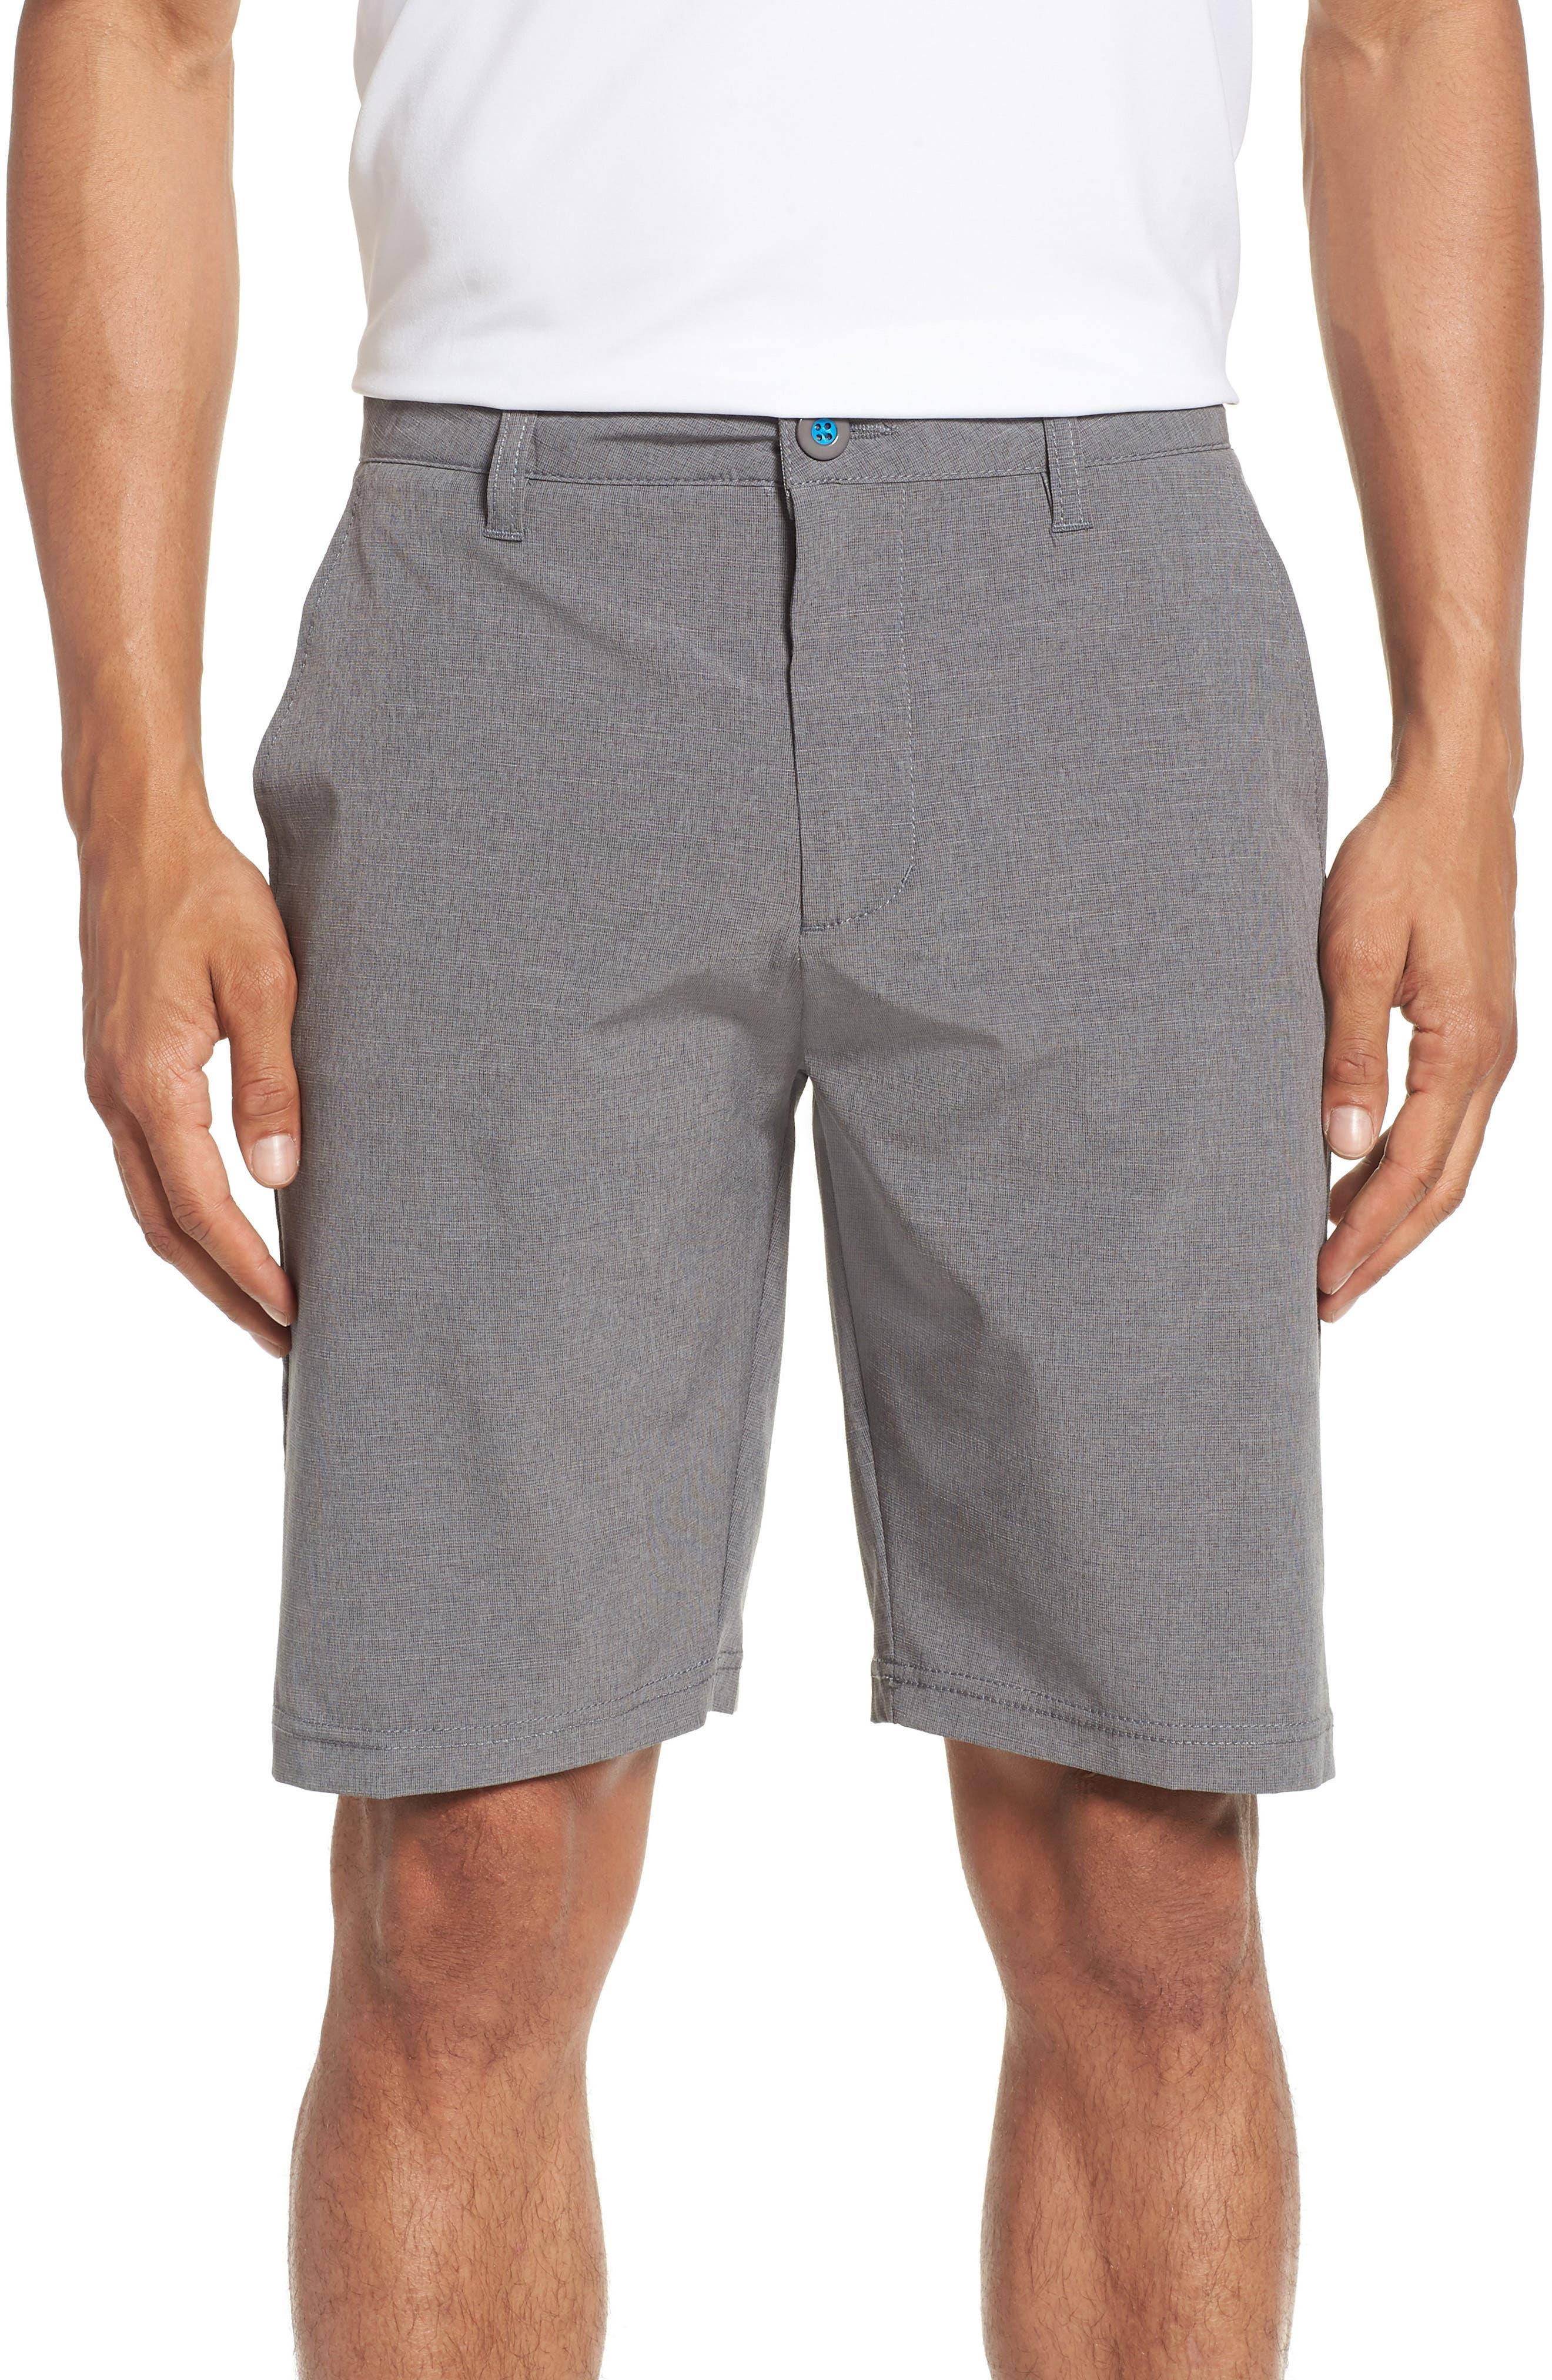 DEVEREUX, Cruiser Hybrid Shorts, Main thumbnail 1, color, CHARCOAL